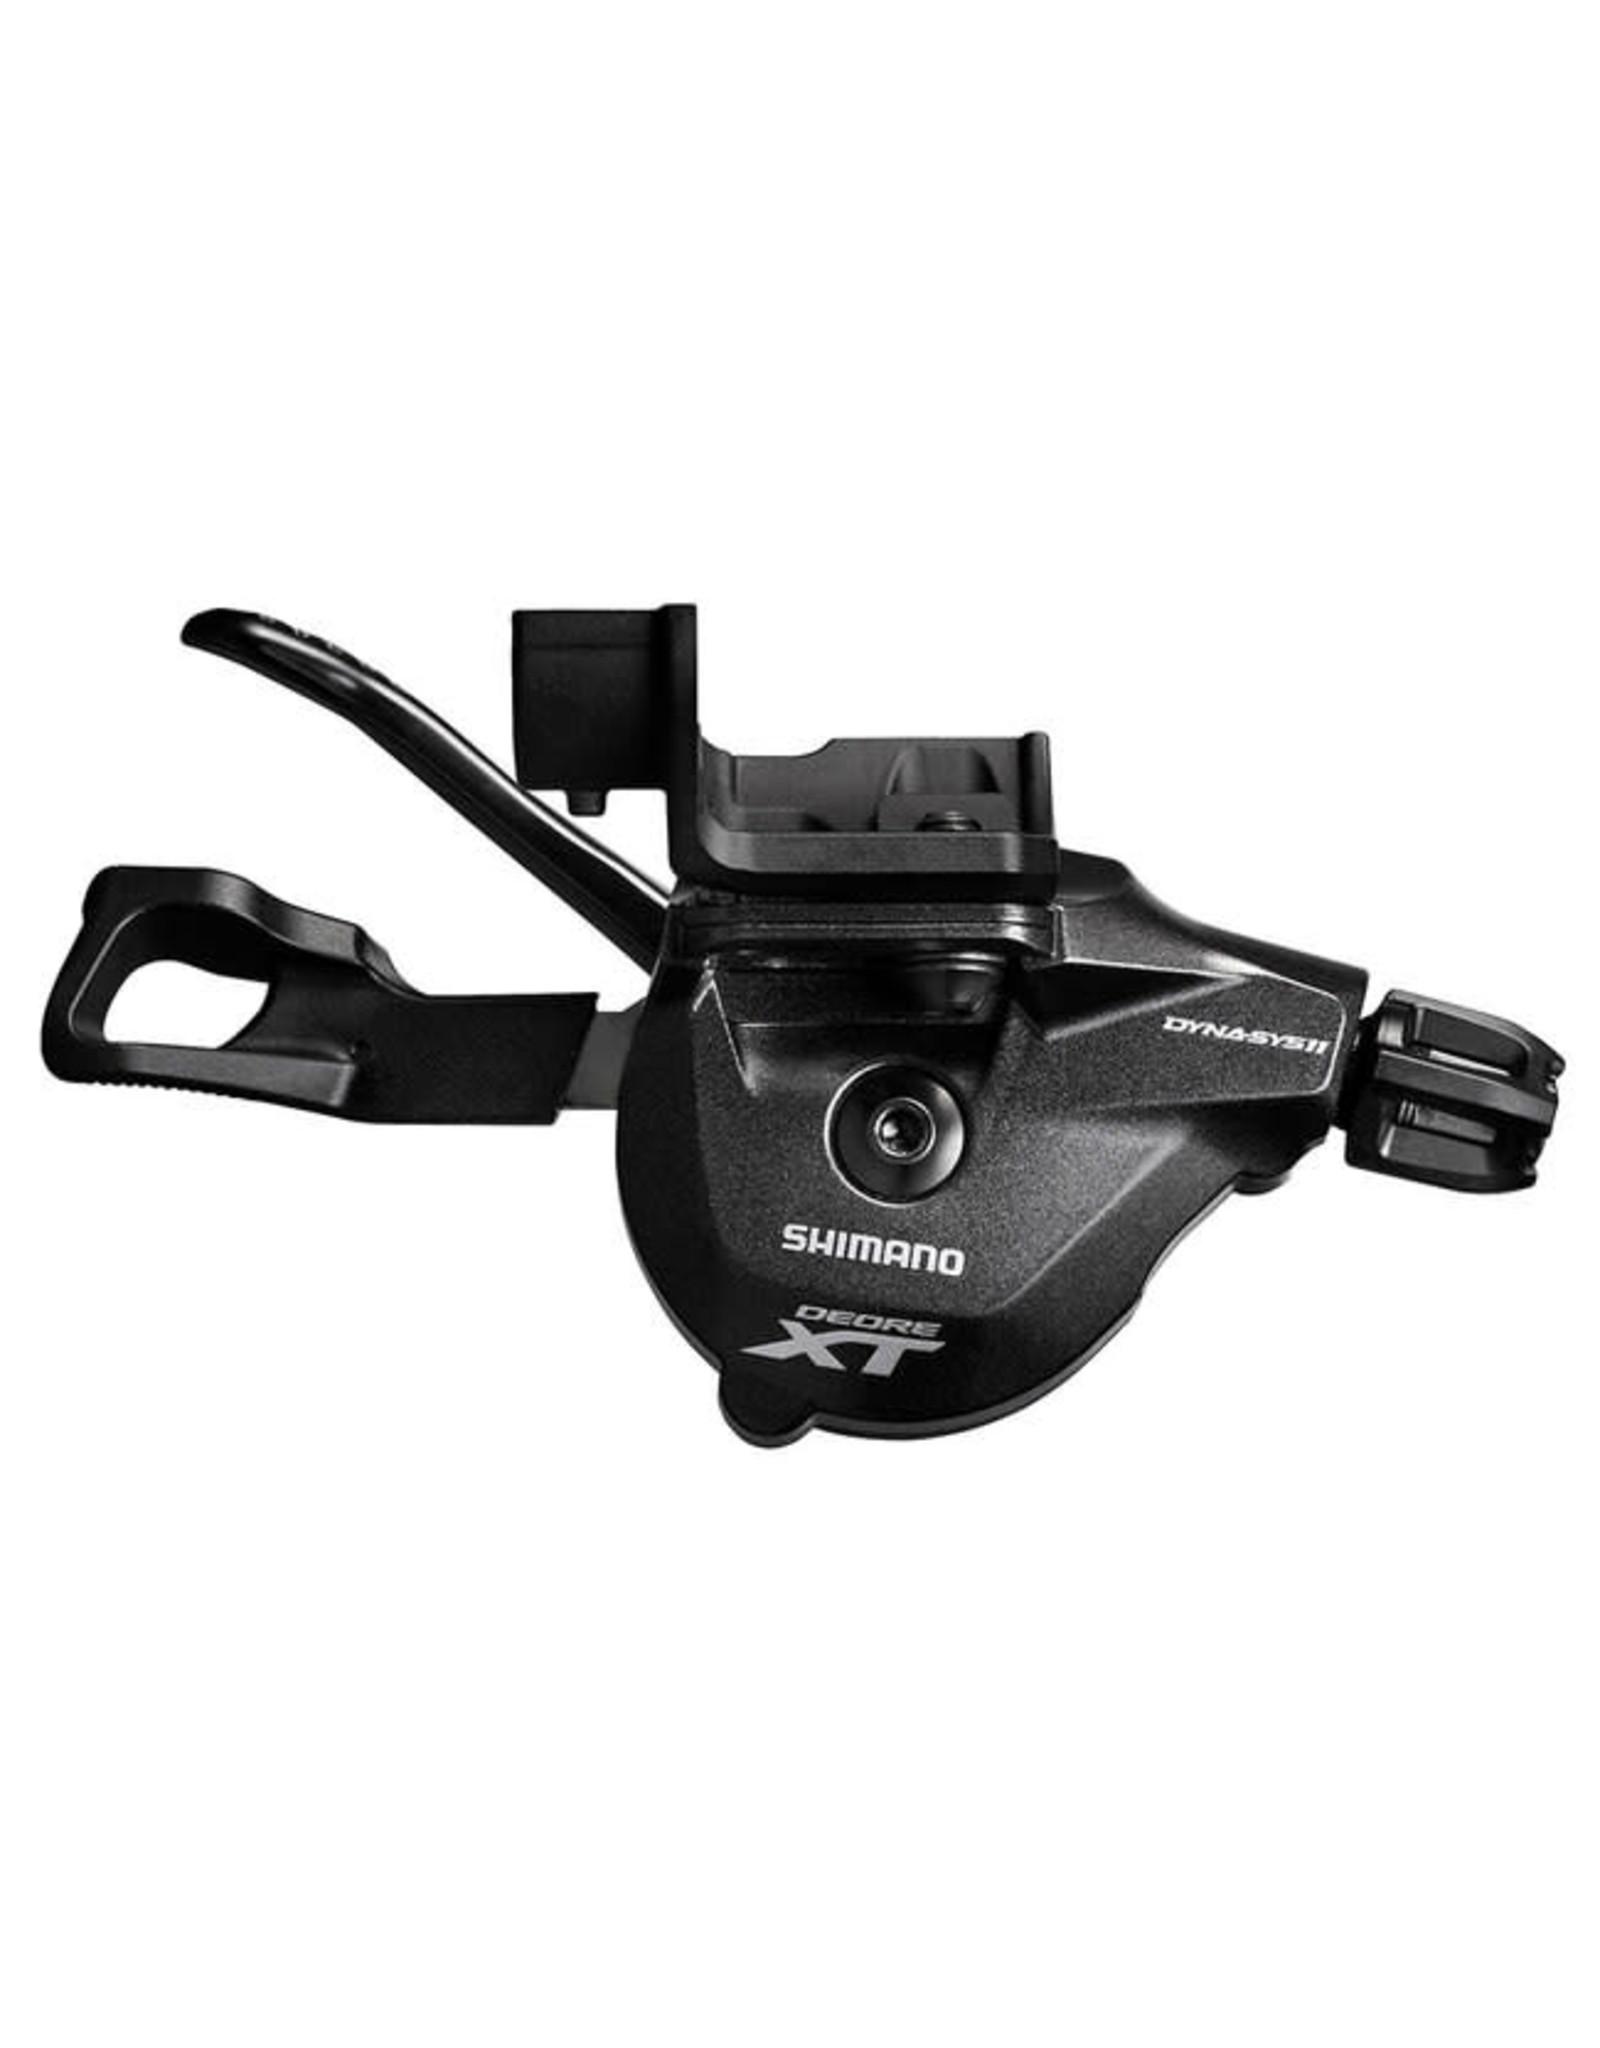 Shimano Shifter Shim M8000 XT 11s